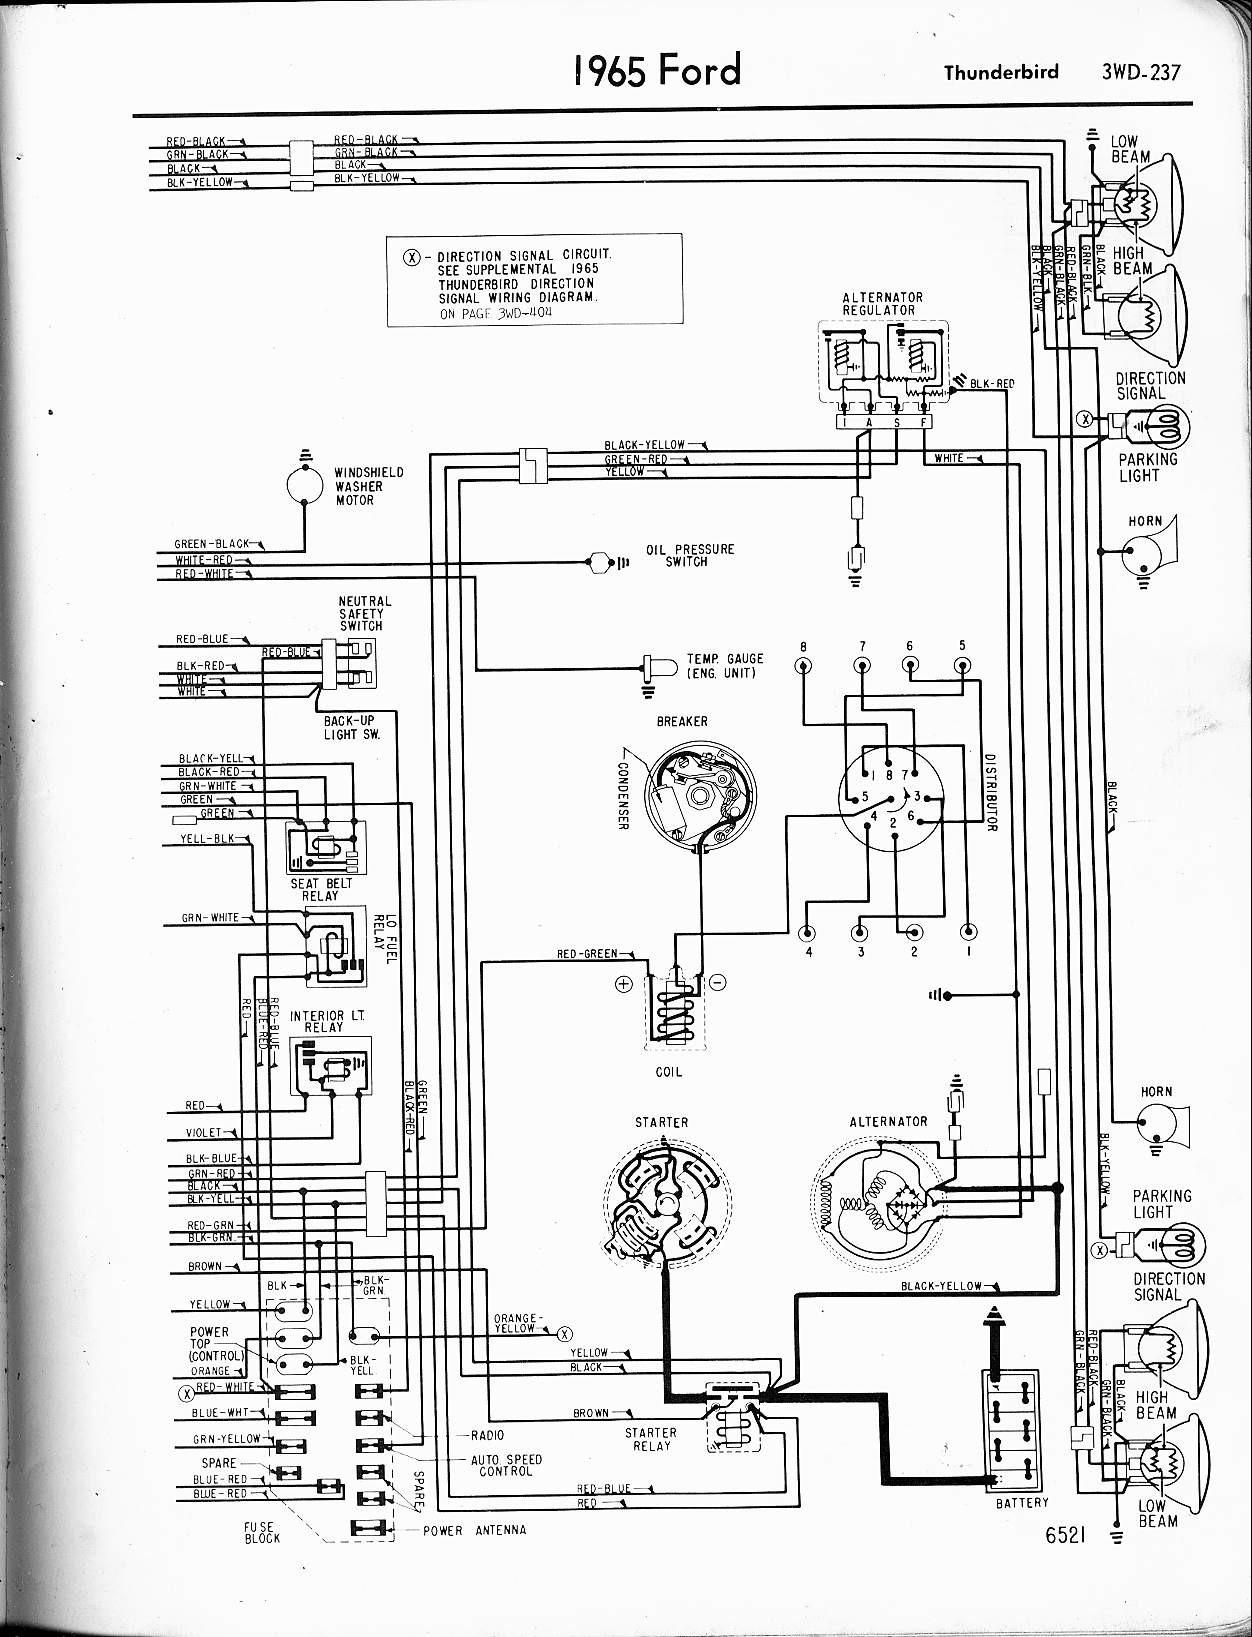 Ford Alternator Wiring Diagrams 57 65 ford Wiring Diagrams Of Ford Alternator Wiring Diagrams